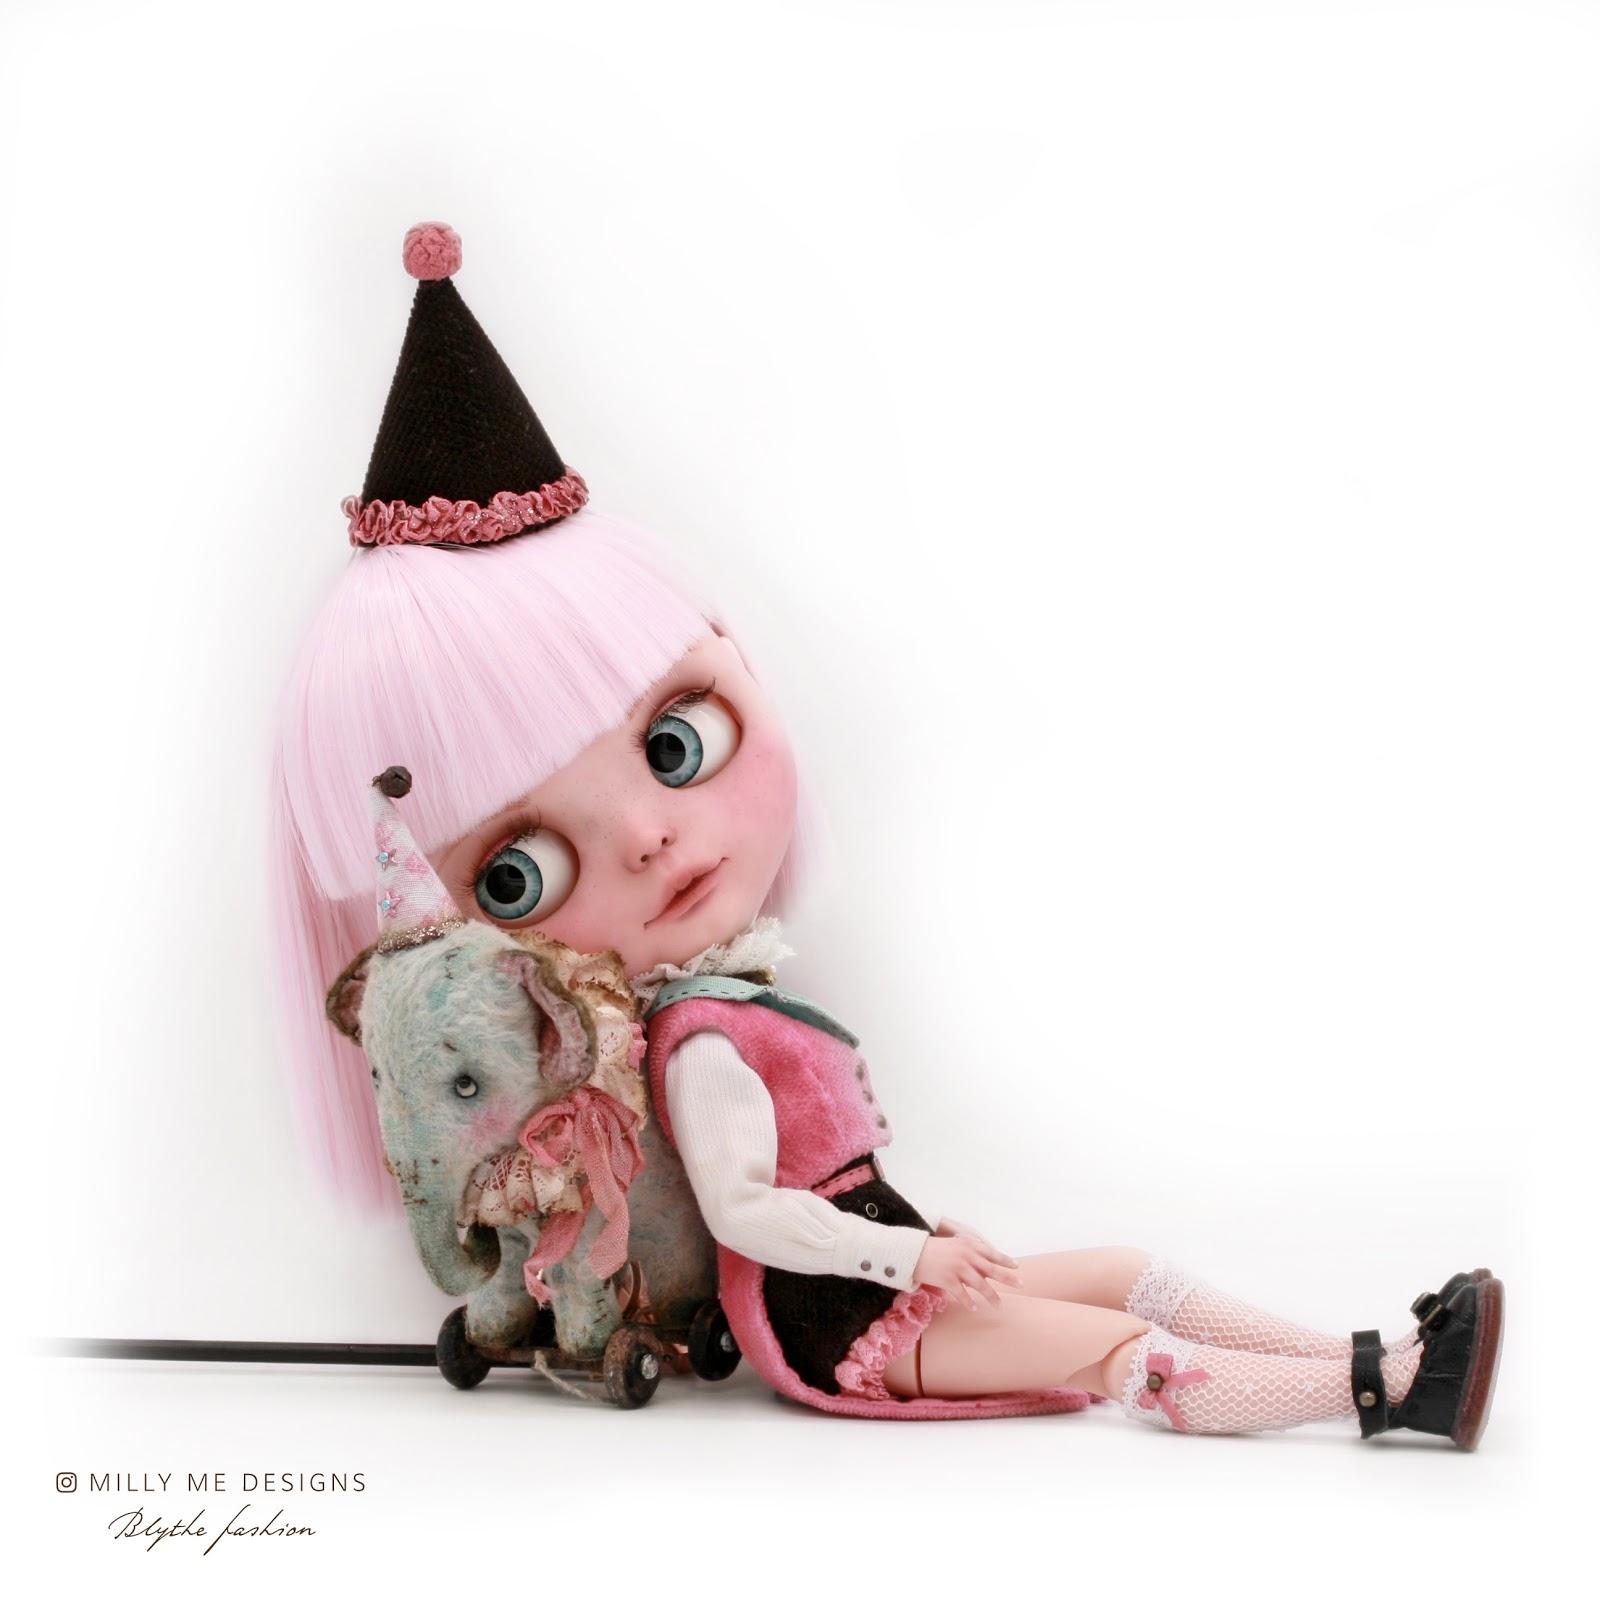 blythe, blythe dress, blythe outfit, blythe clothes, mini toy blythe, custom blythe, ブライス, ブライス人形, ブライスドール, カスタムブライス